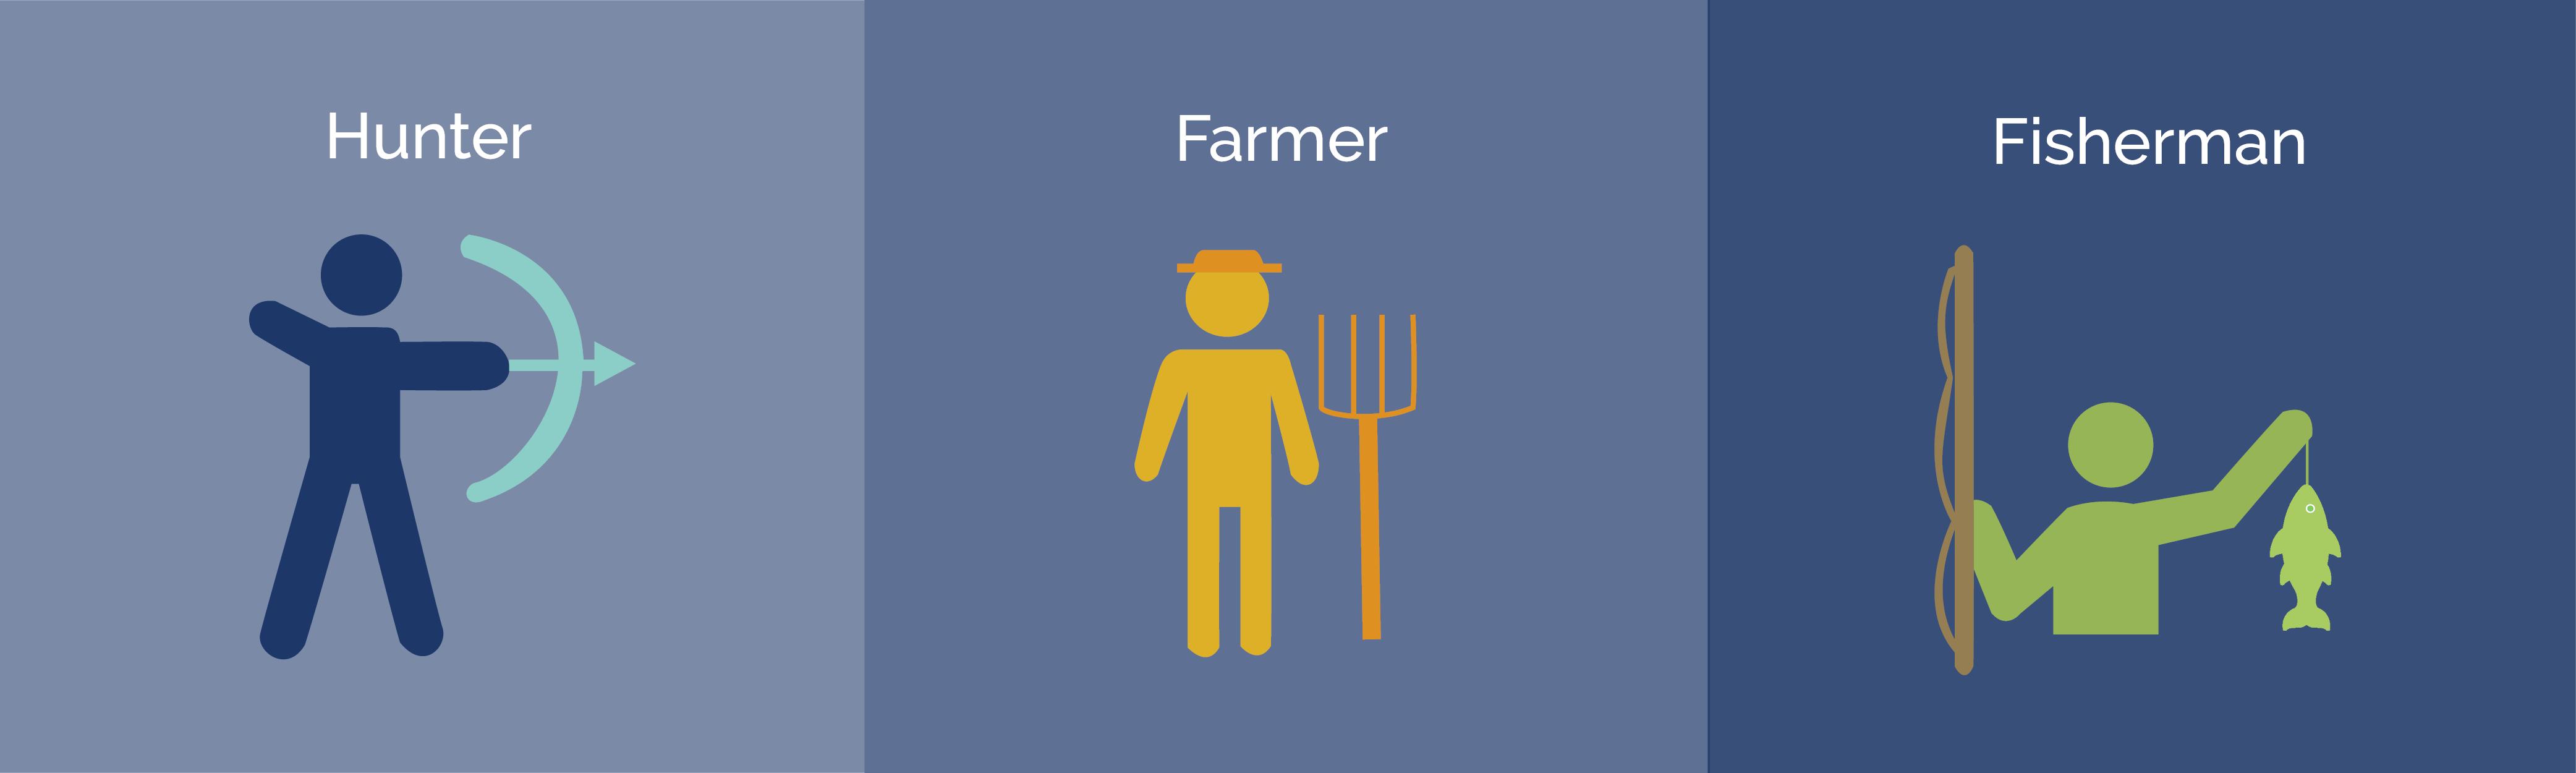 hunter farmer fisherman